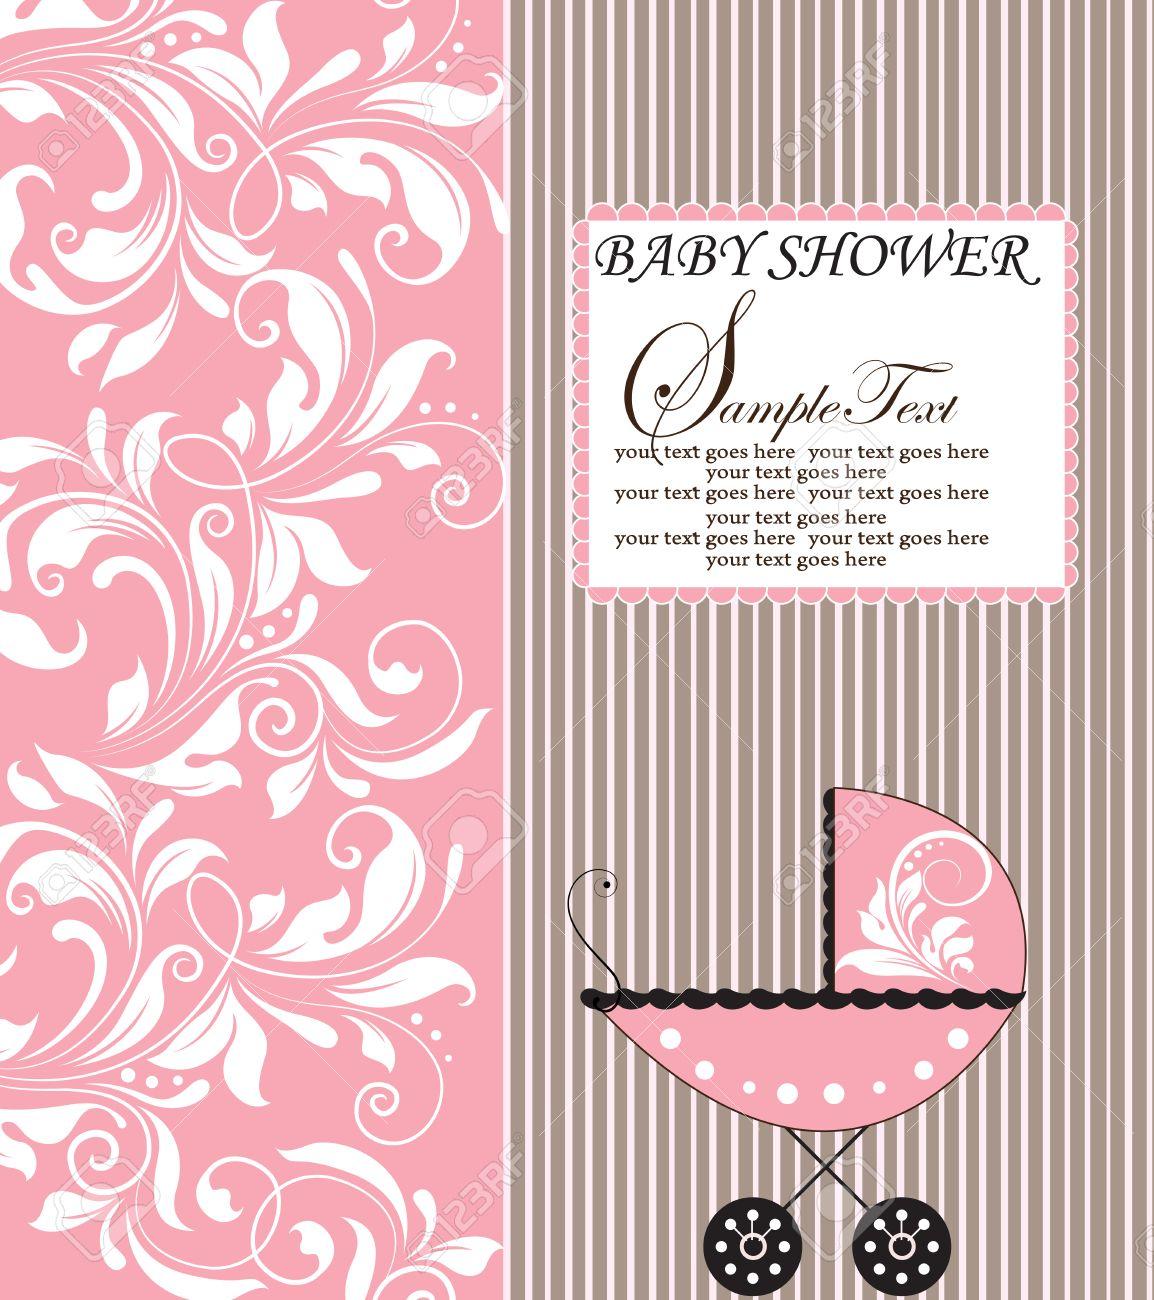 vintage baby shower invitation card with ornate elegant retro, Baby shower